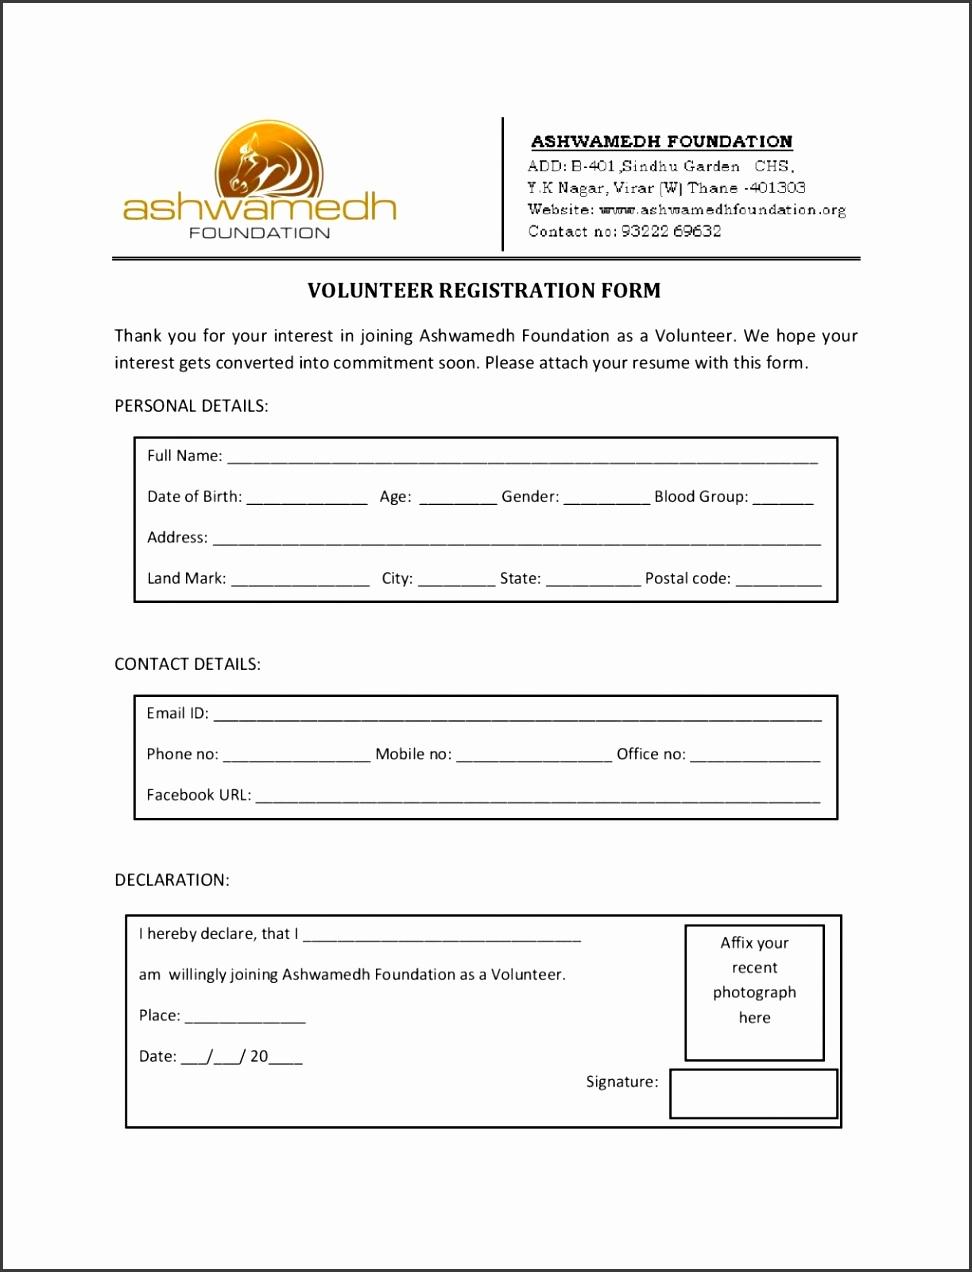 Eventration Form Volunteer Cornell Template Microsoft Word Create WordPress Example Event Registration Free Printable 1024